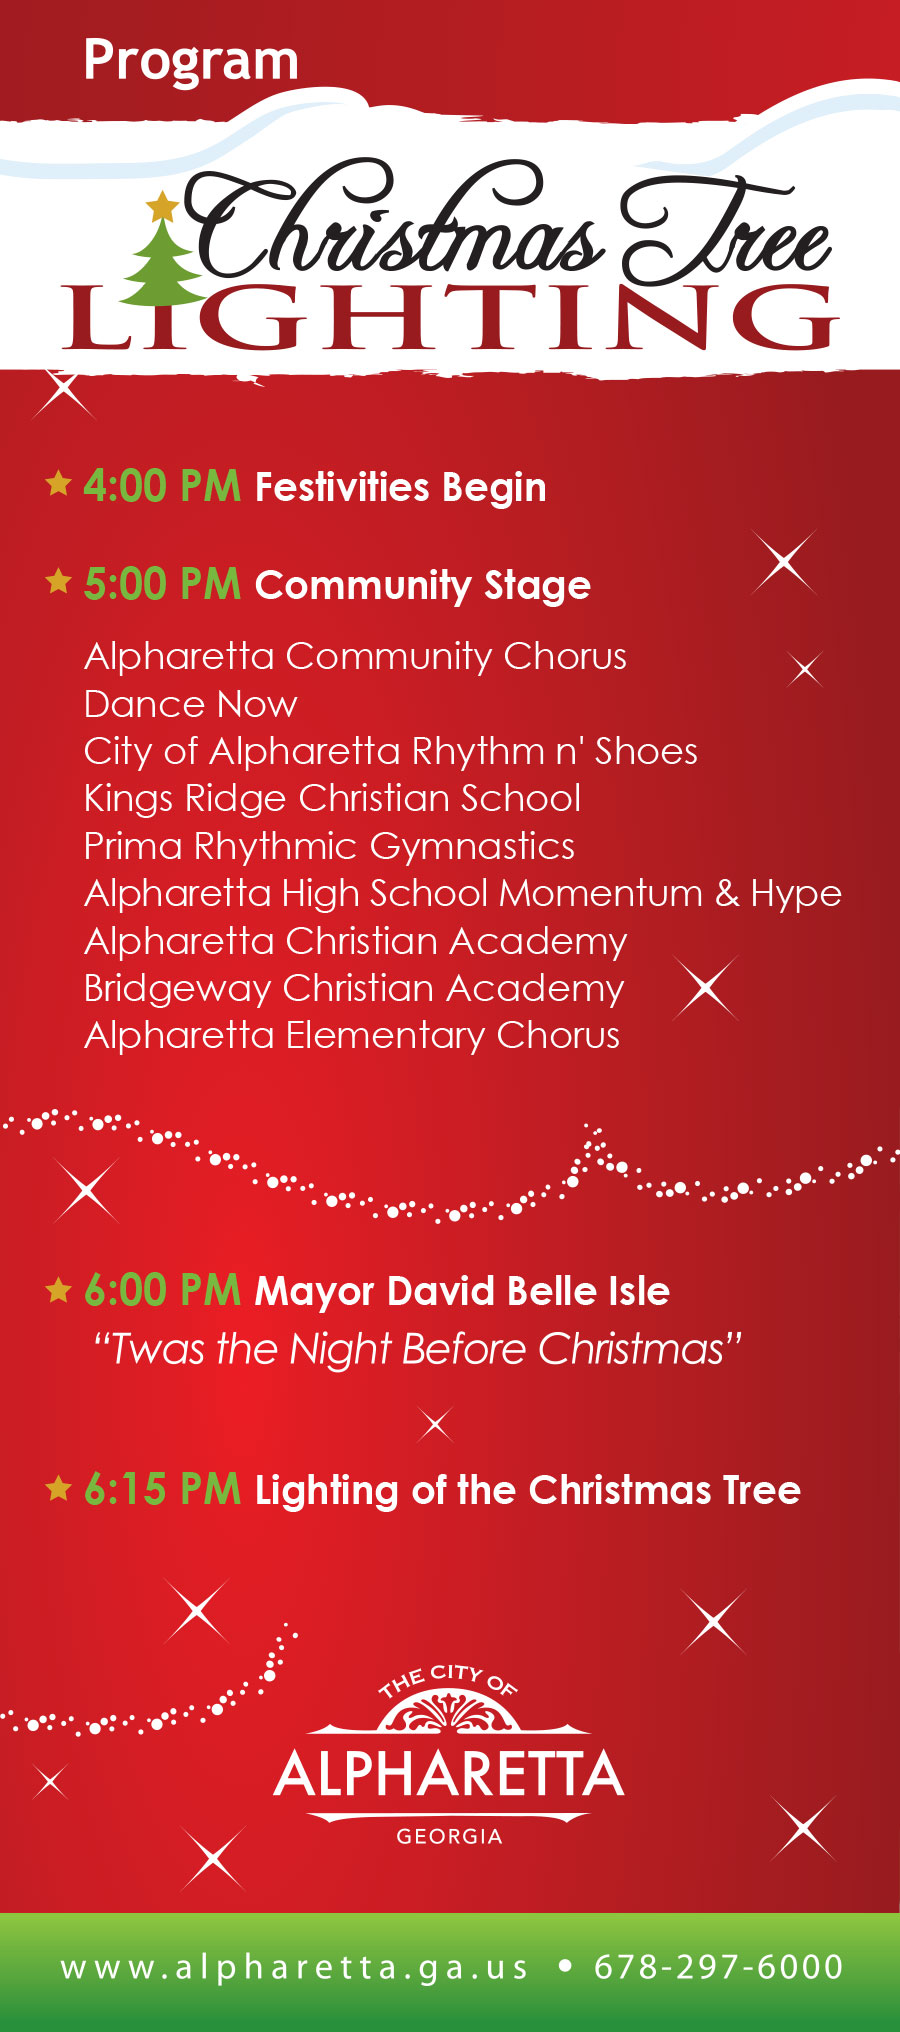 40th-annual-christmas-tree-lighting-program-2 & Christmas Tree Lighting azcodes.com